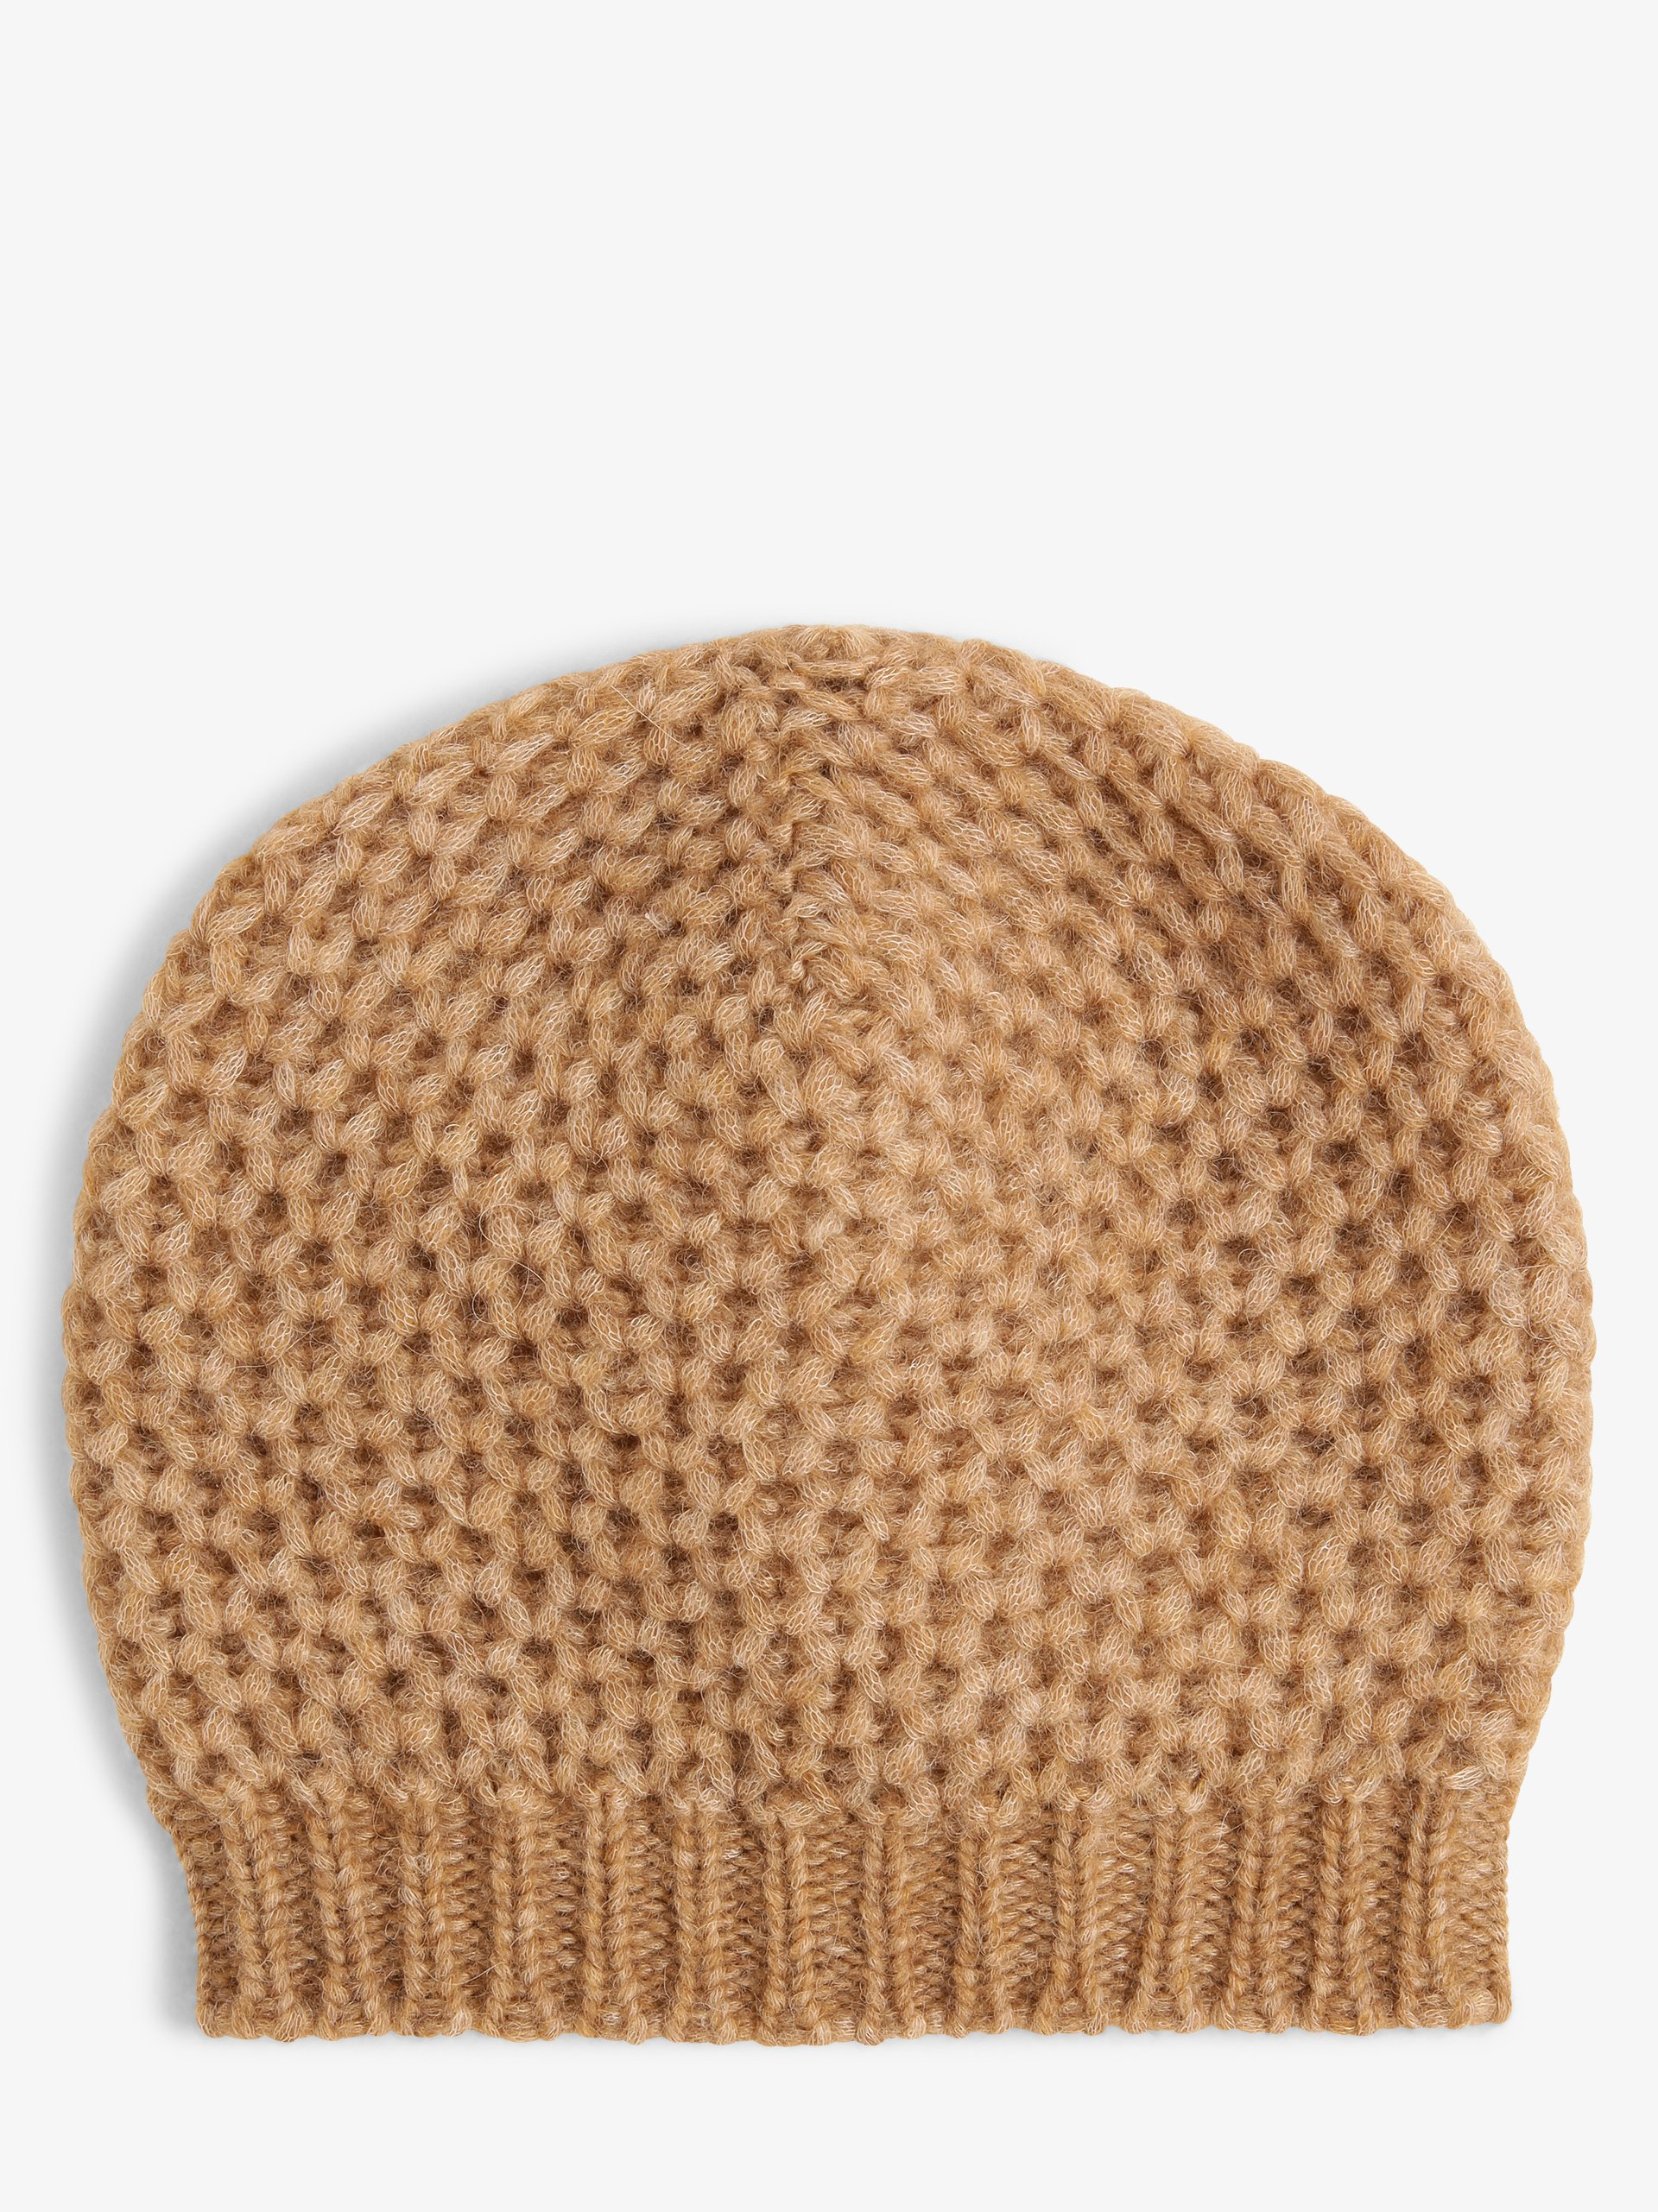 BOSS Casual Damen Mütze mit Alpaka-Anteil - Wandersy